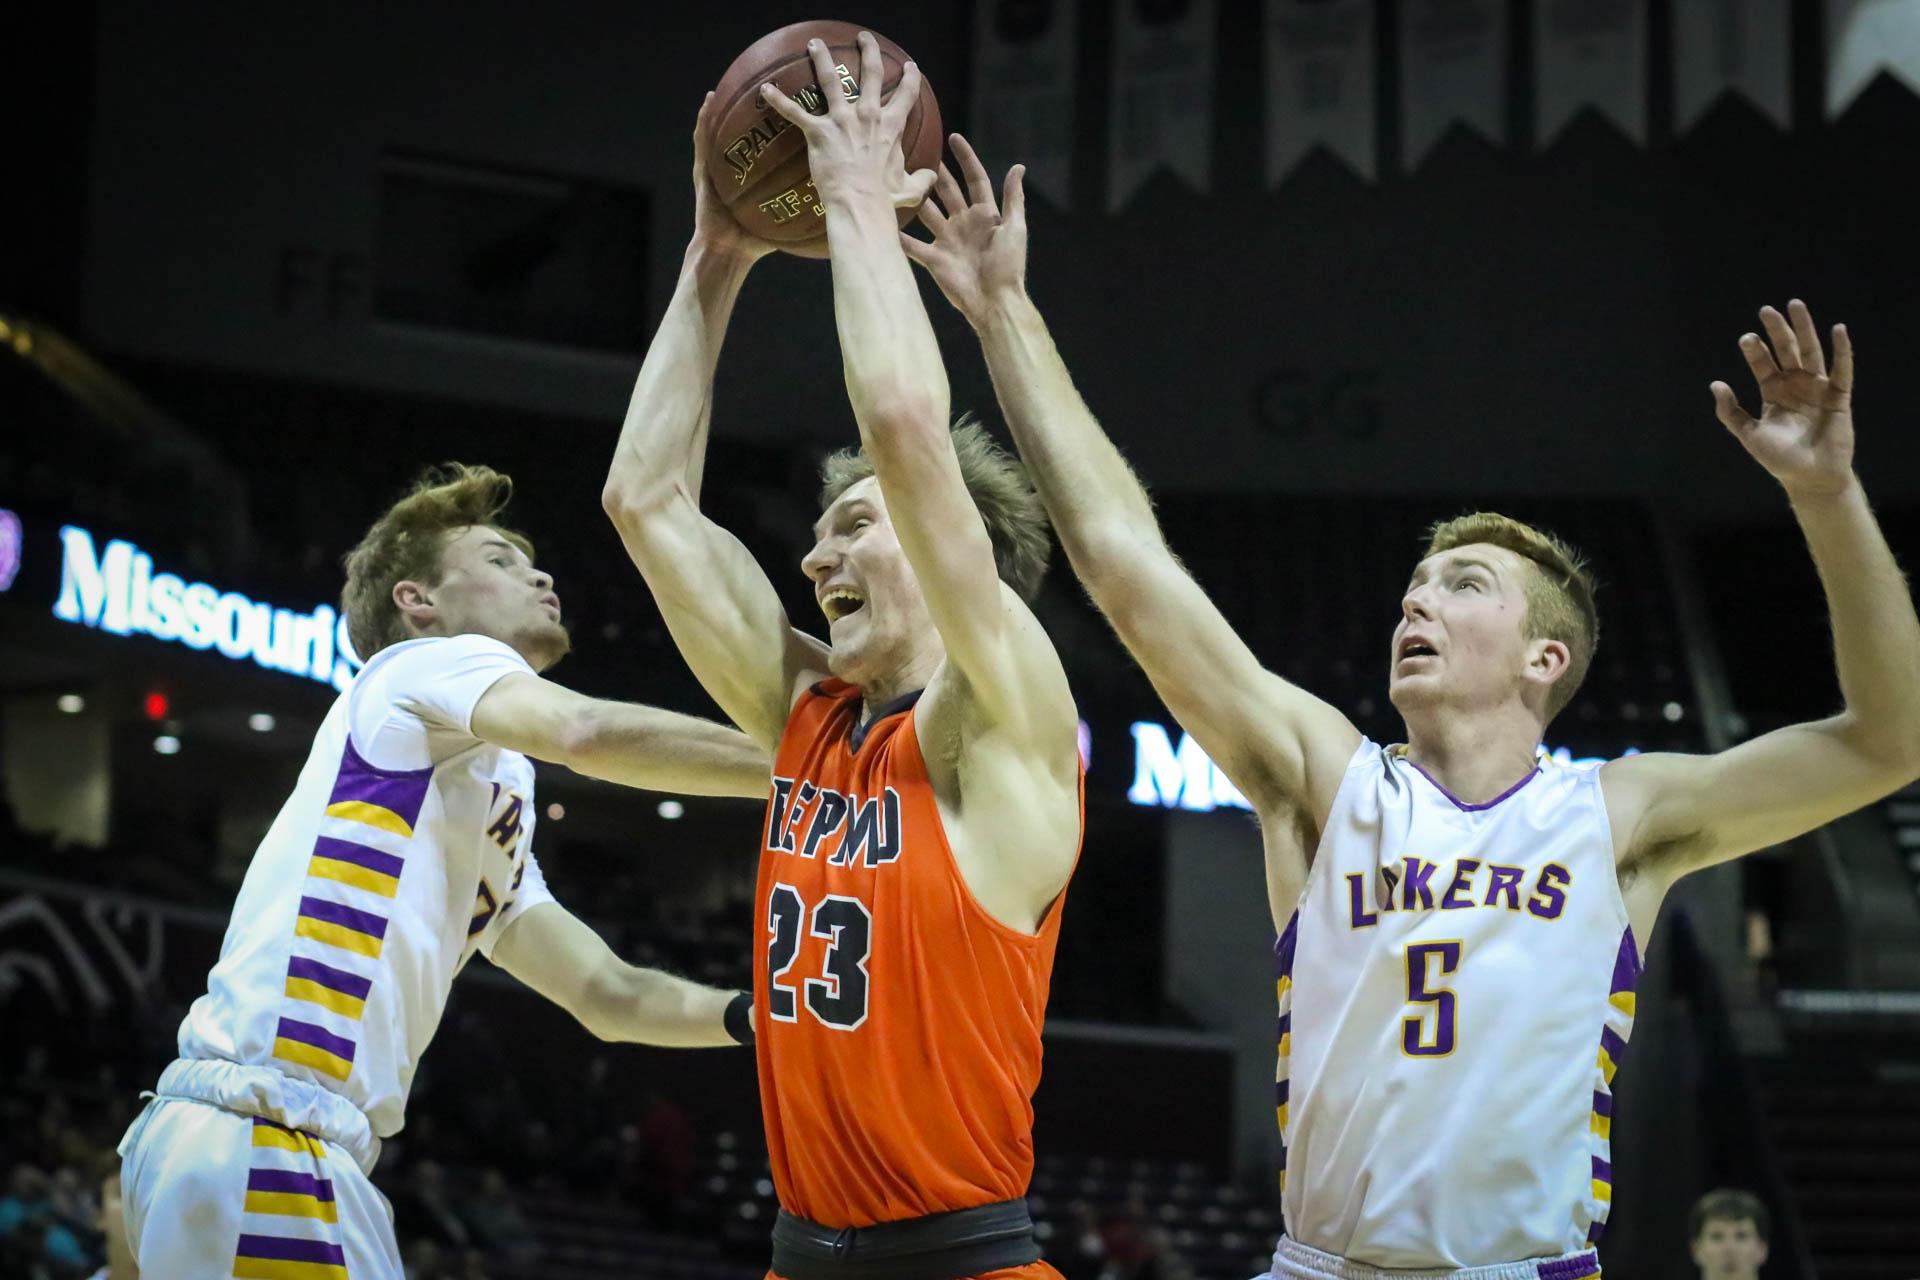 Photos:  Varsity Boys Basketball Vs Camdenton